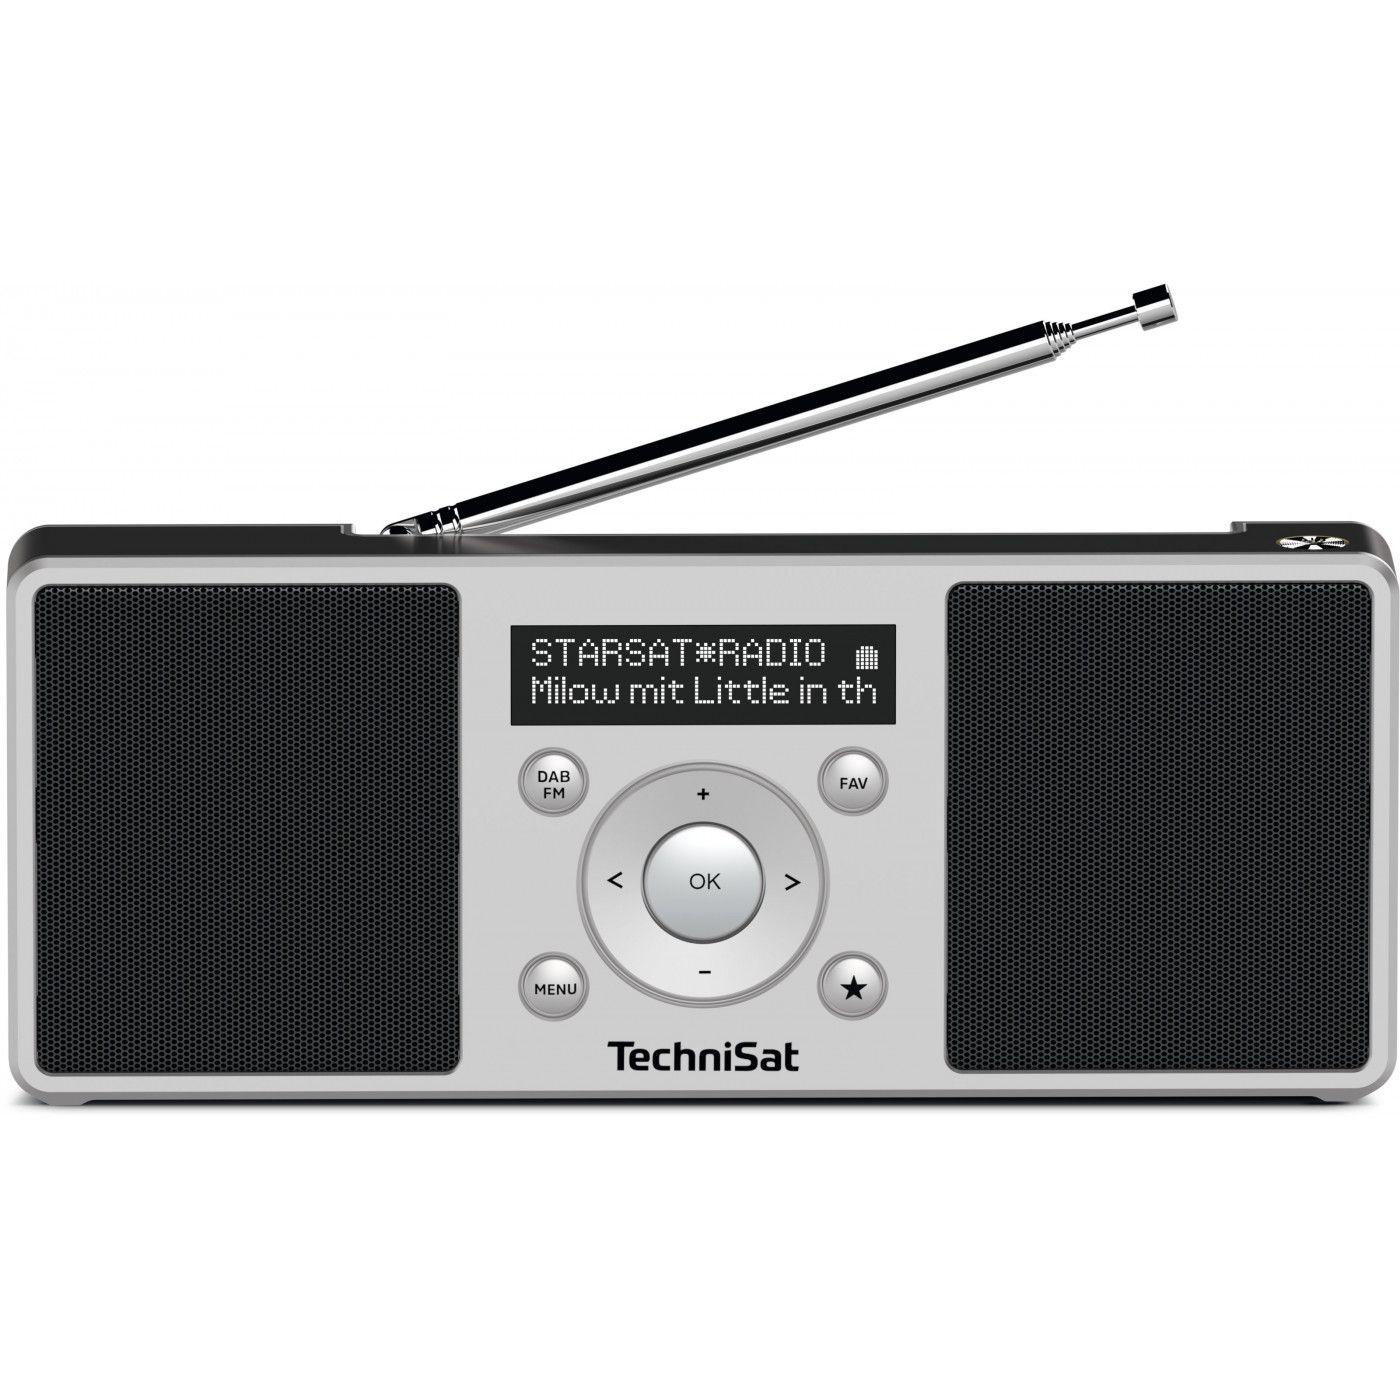 TechniSat Digitradio 1 DAB Stereo bei Amazon Prime